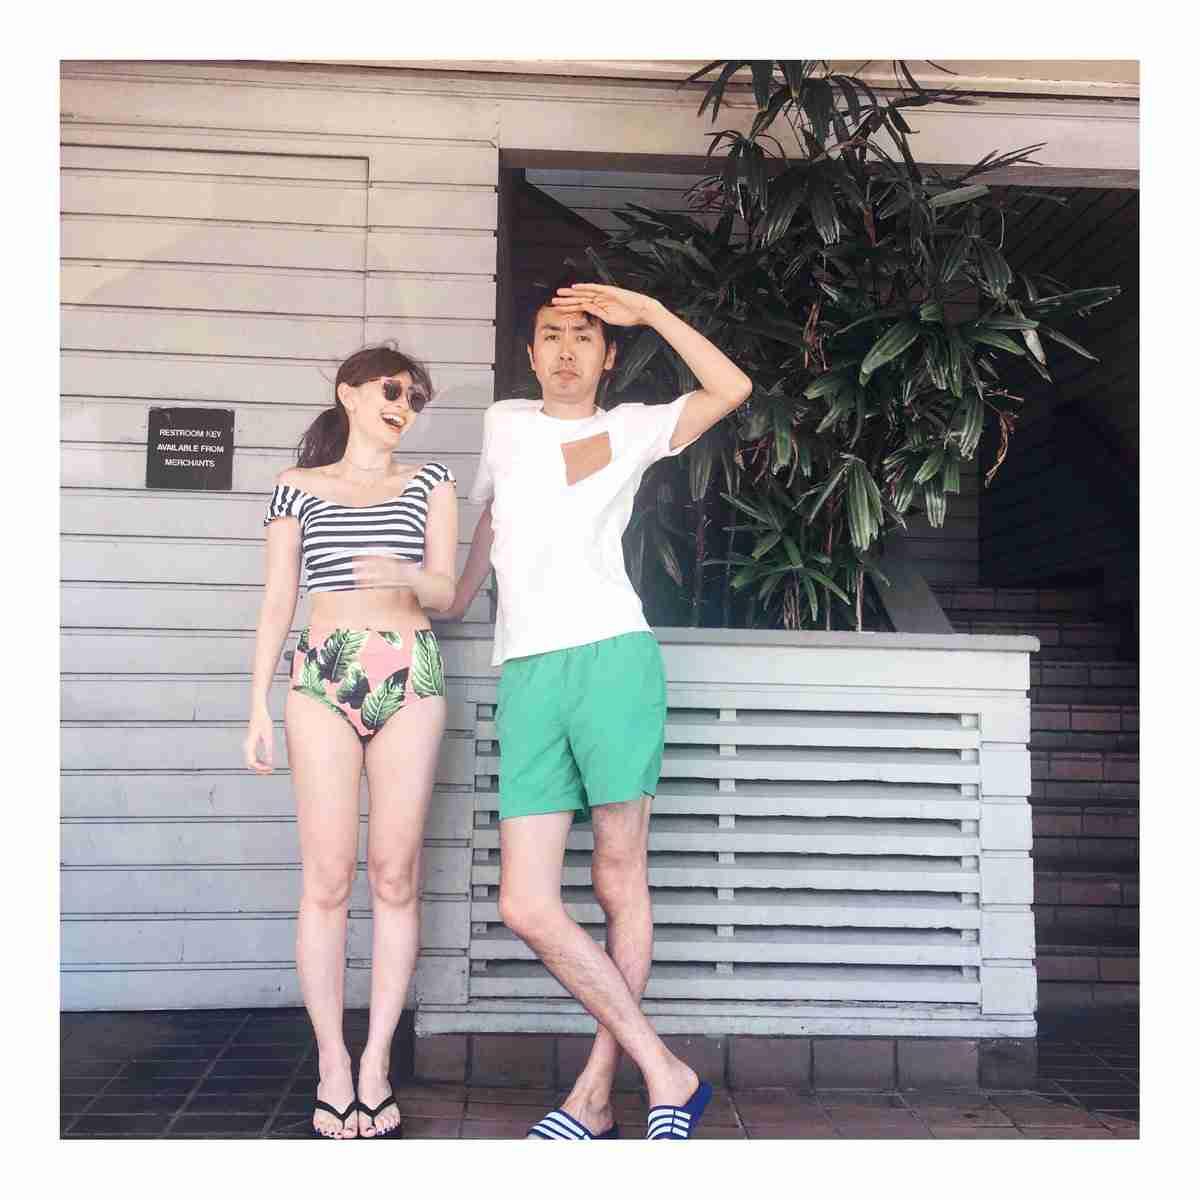 AKB48の小嶋陽菜、ピンクの世界で輝く美脚披露 女性写真家3名とフォトセッション